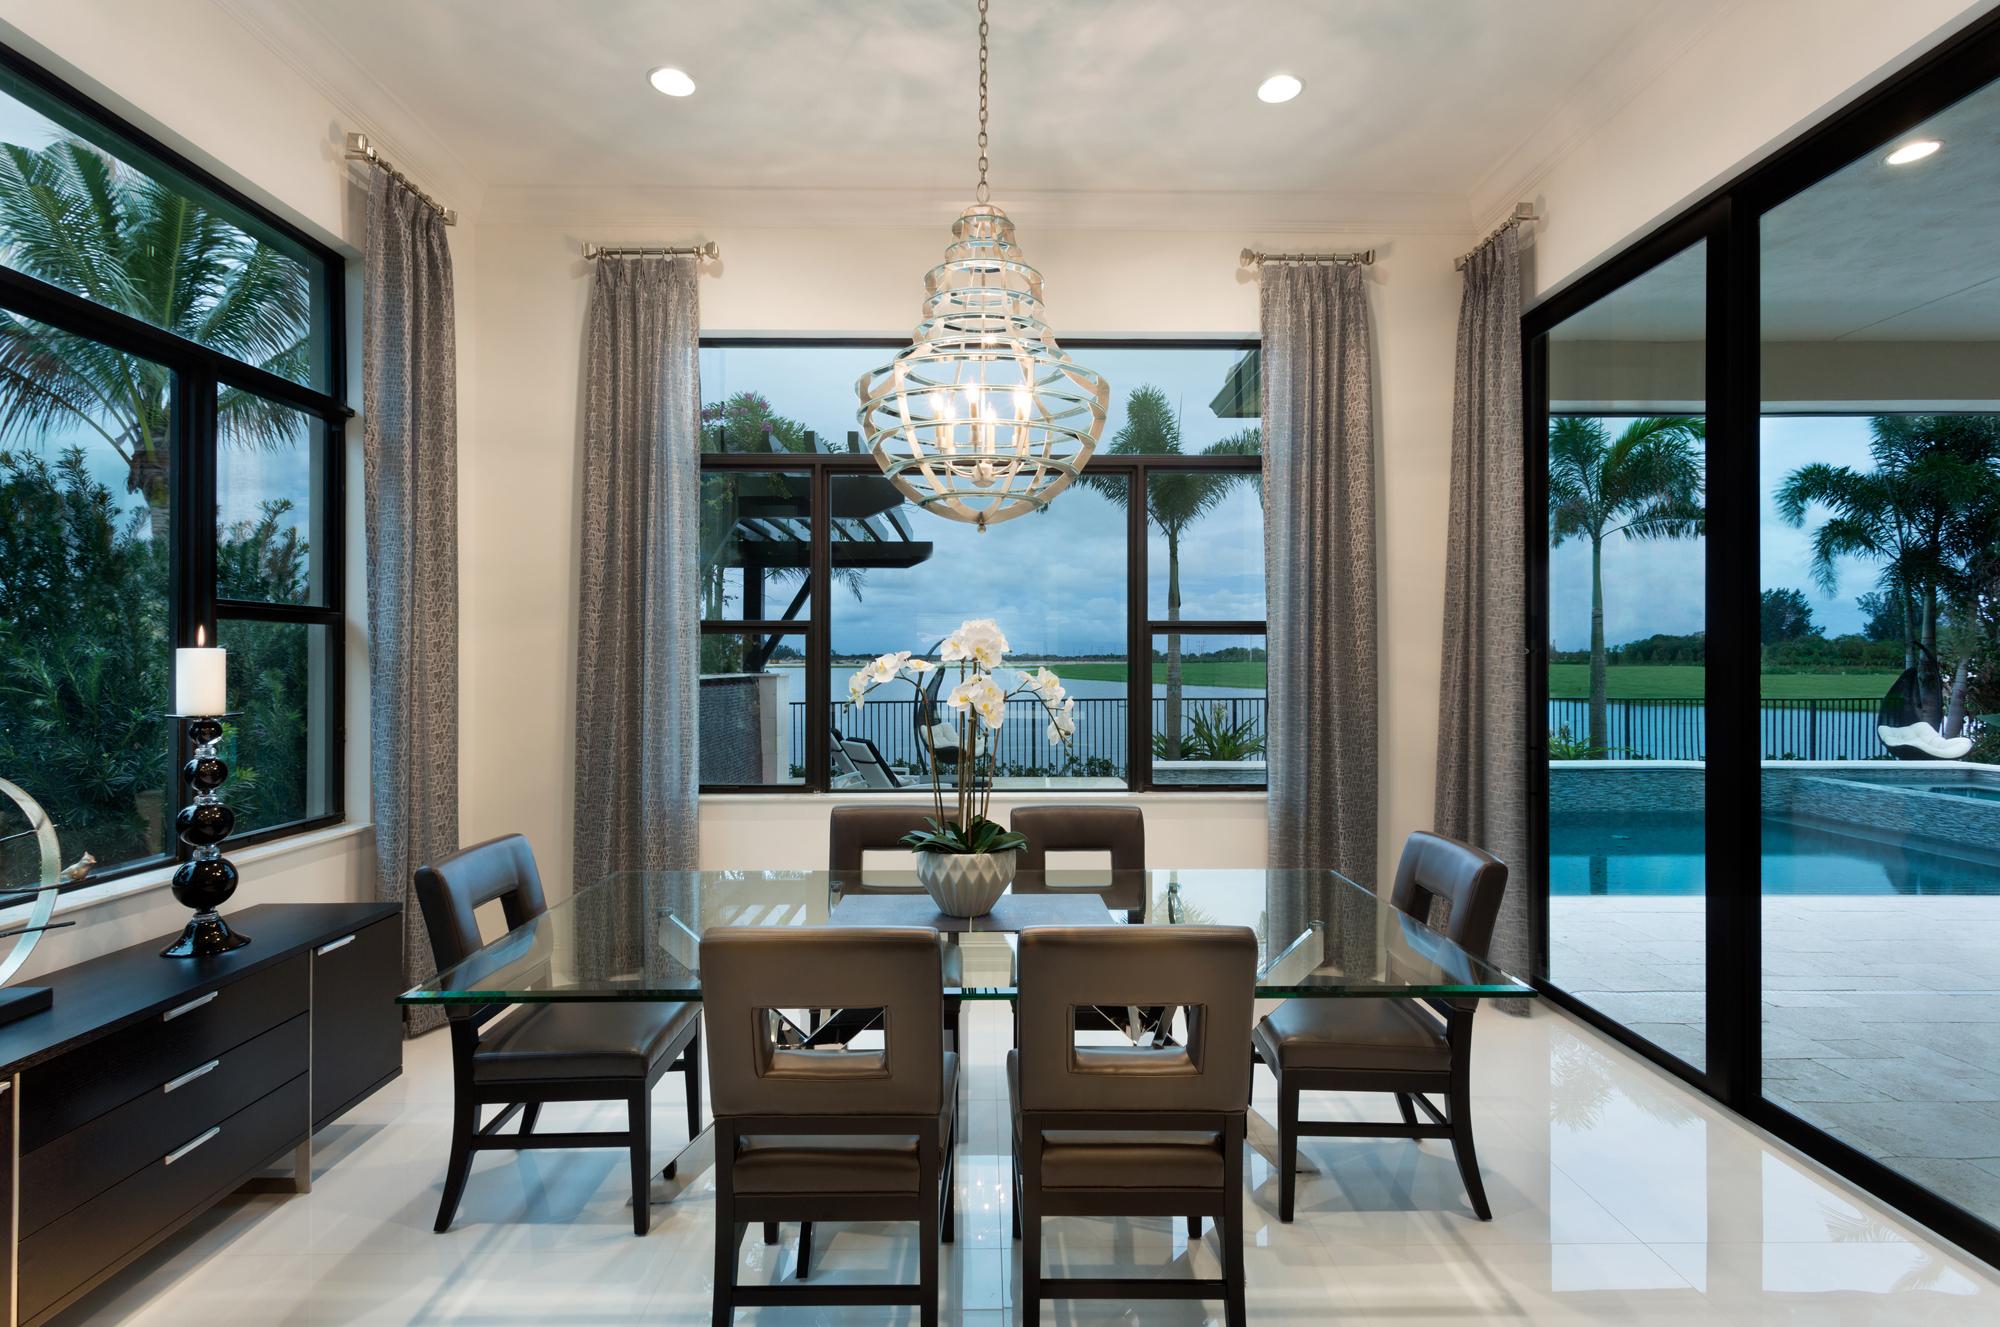 residential-interior-photographer-florida.jpg